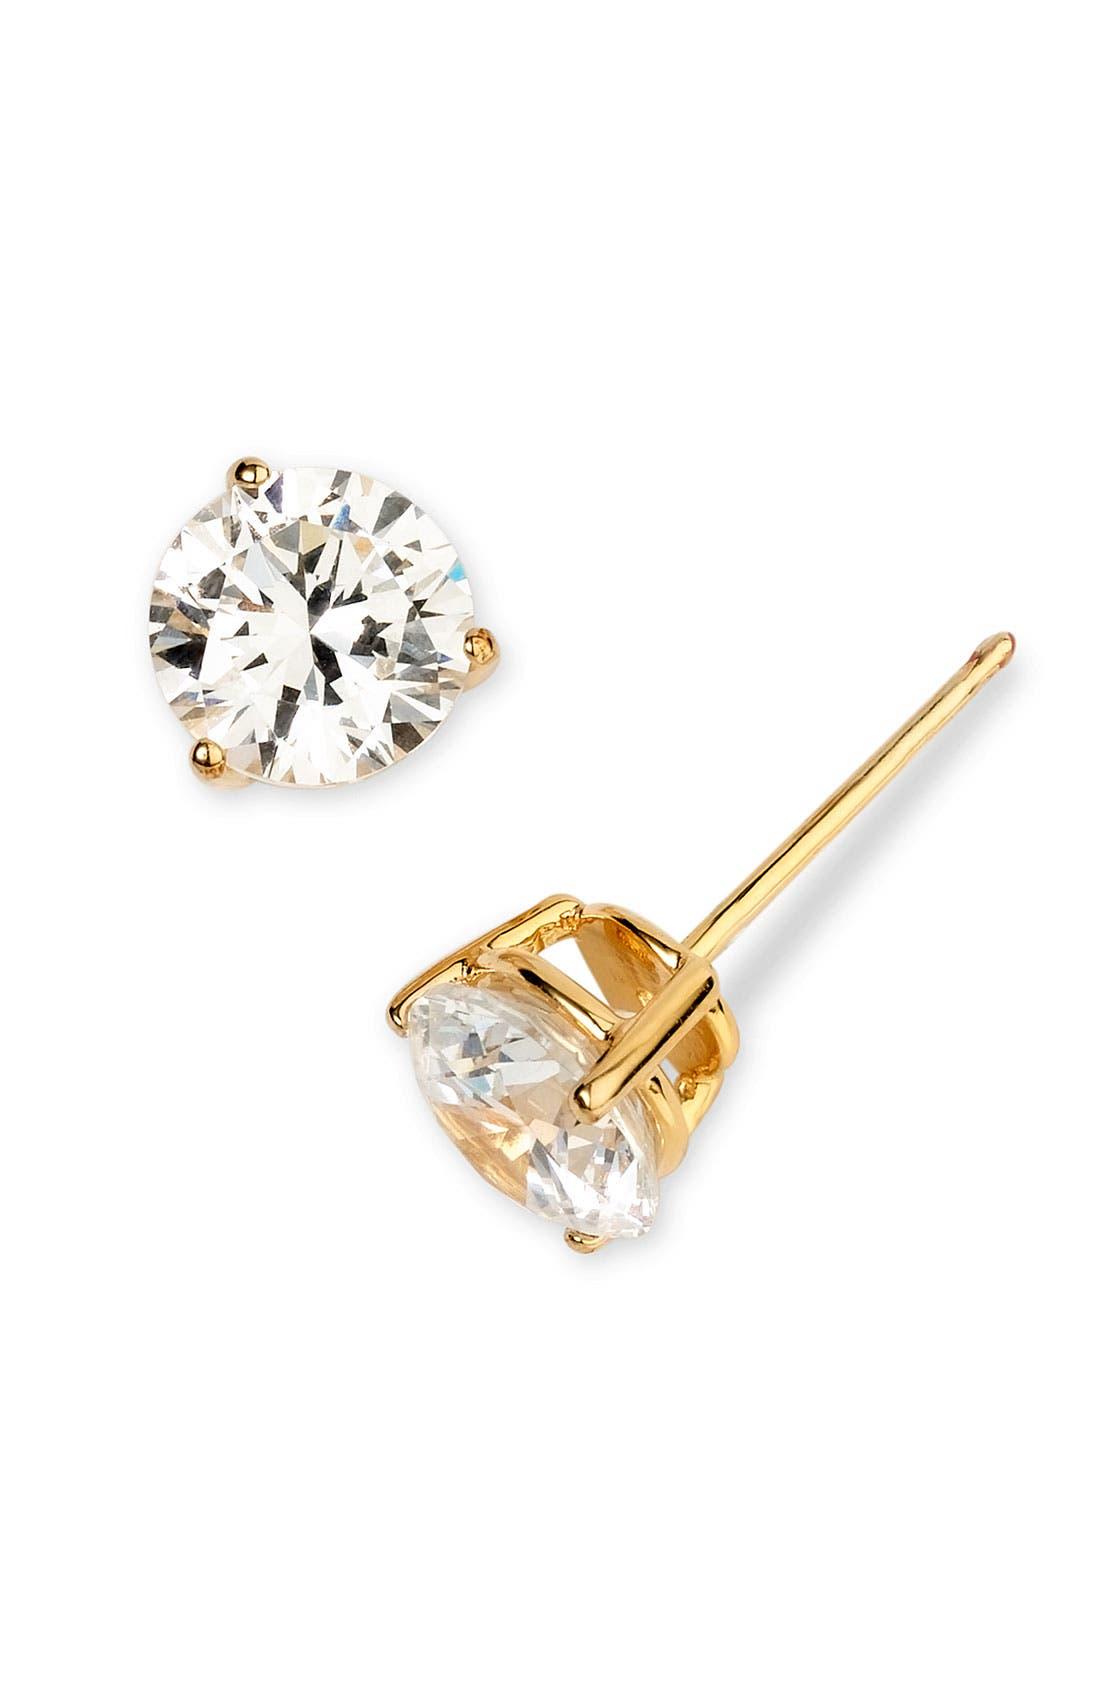 3ct tw Cubic Zirconia Earrings,                             Alternate thumbnail 2, color,                             Gold Vermeil